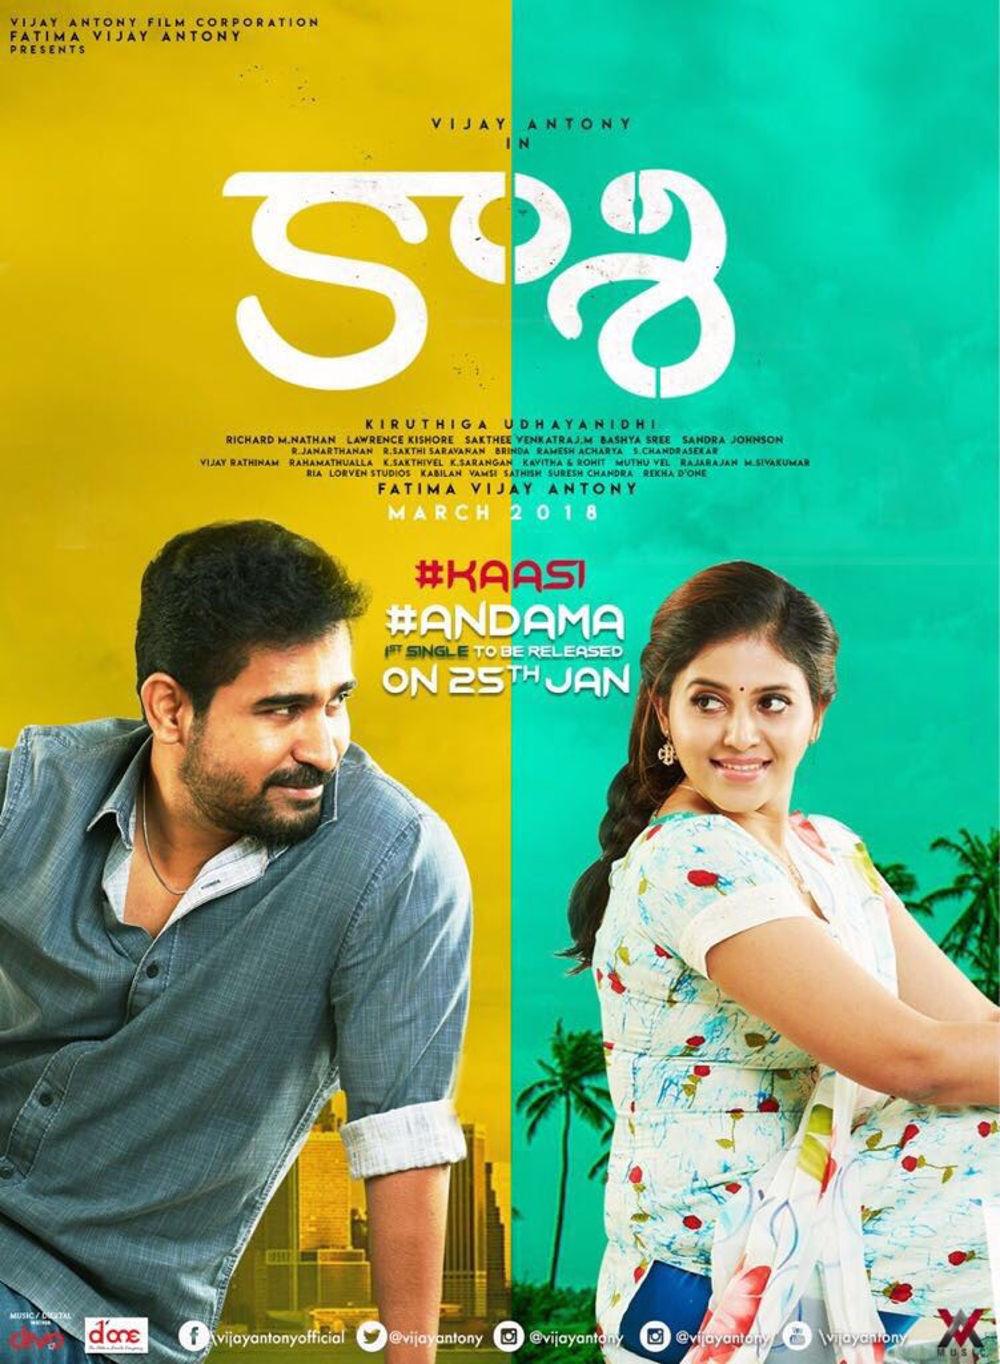 Vijay Antony' Anjali 'Kaasi' First Look Poster